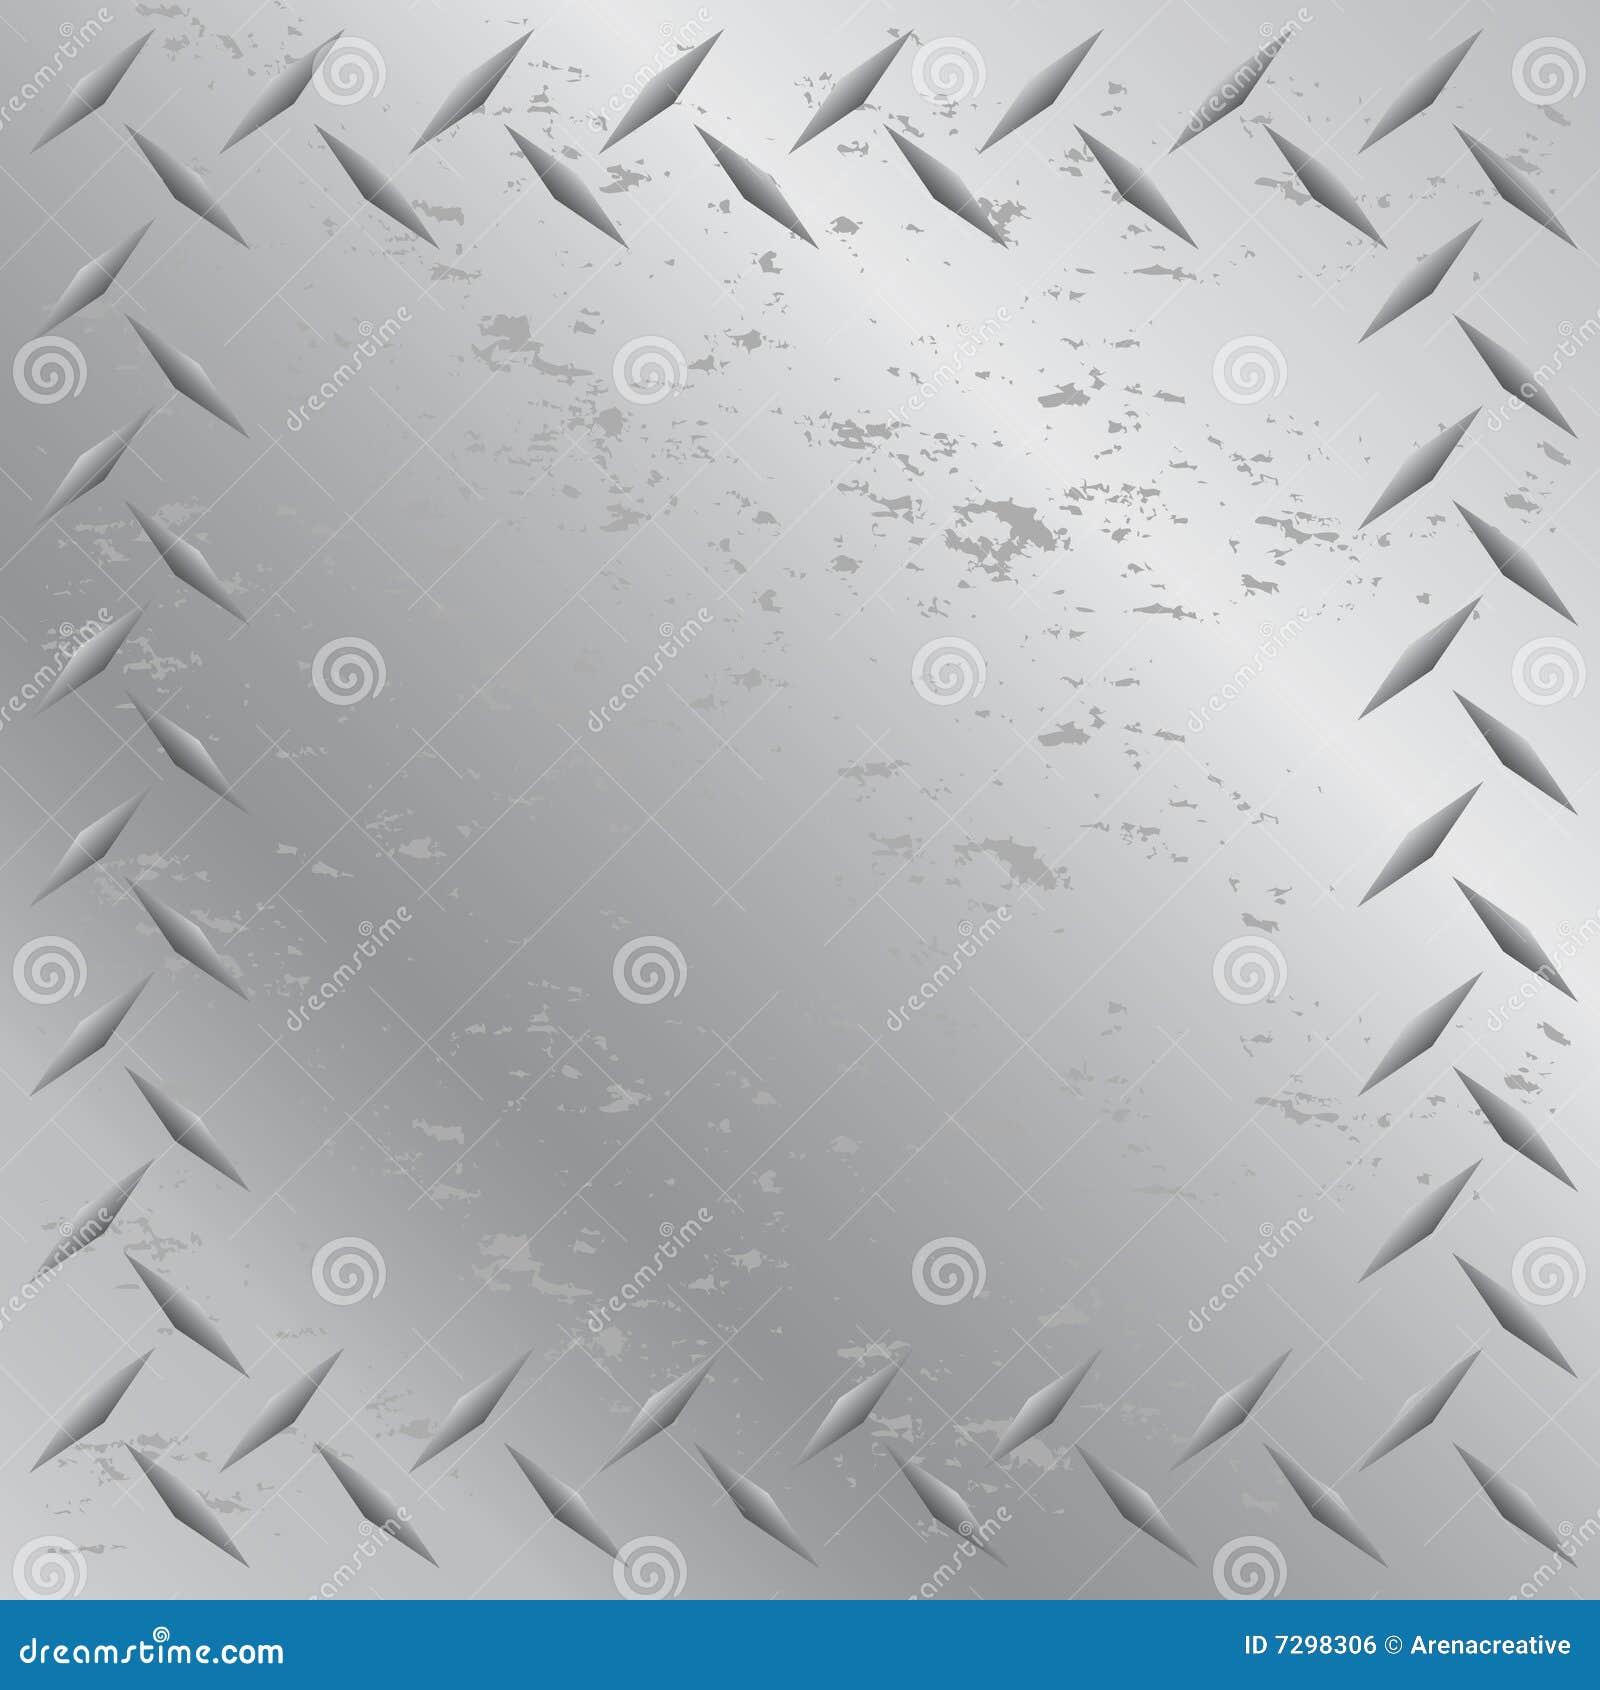 diamond plate metallic border - photo #49